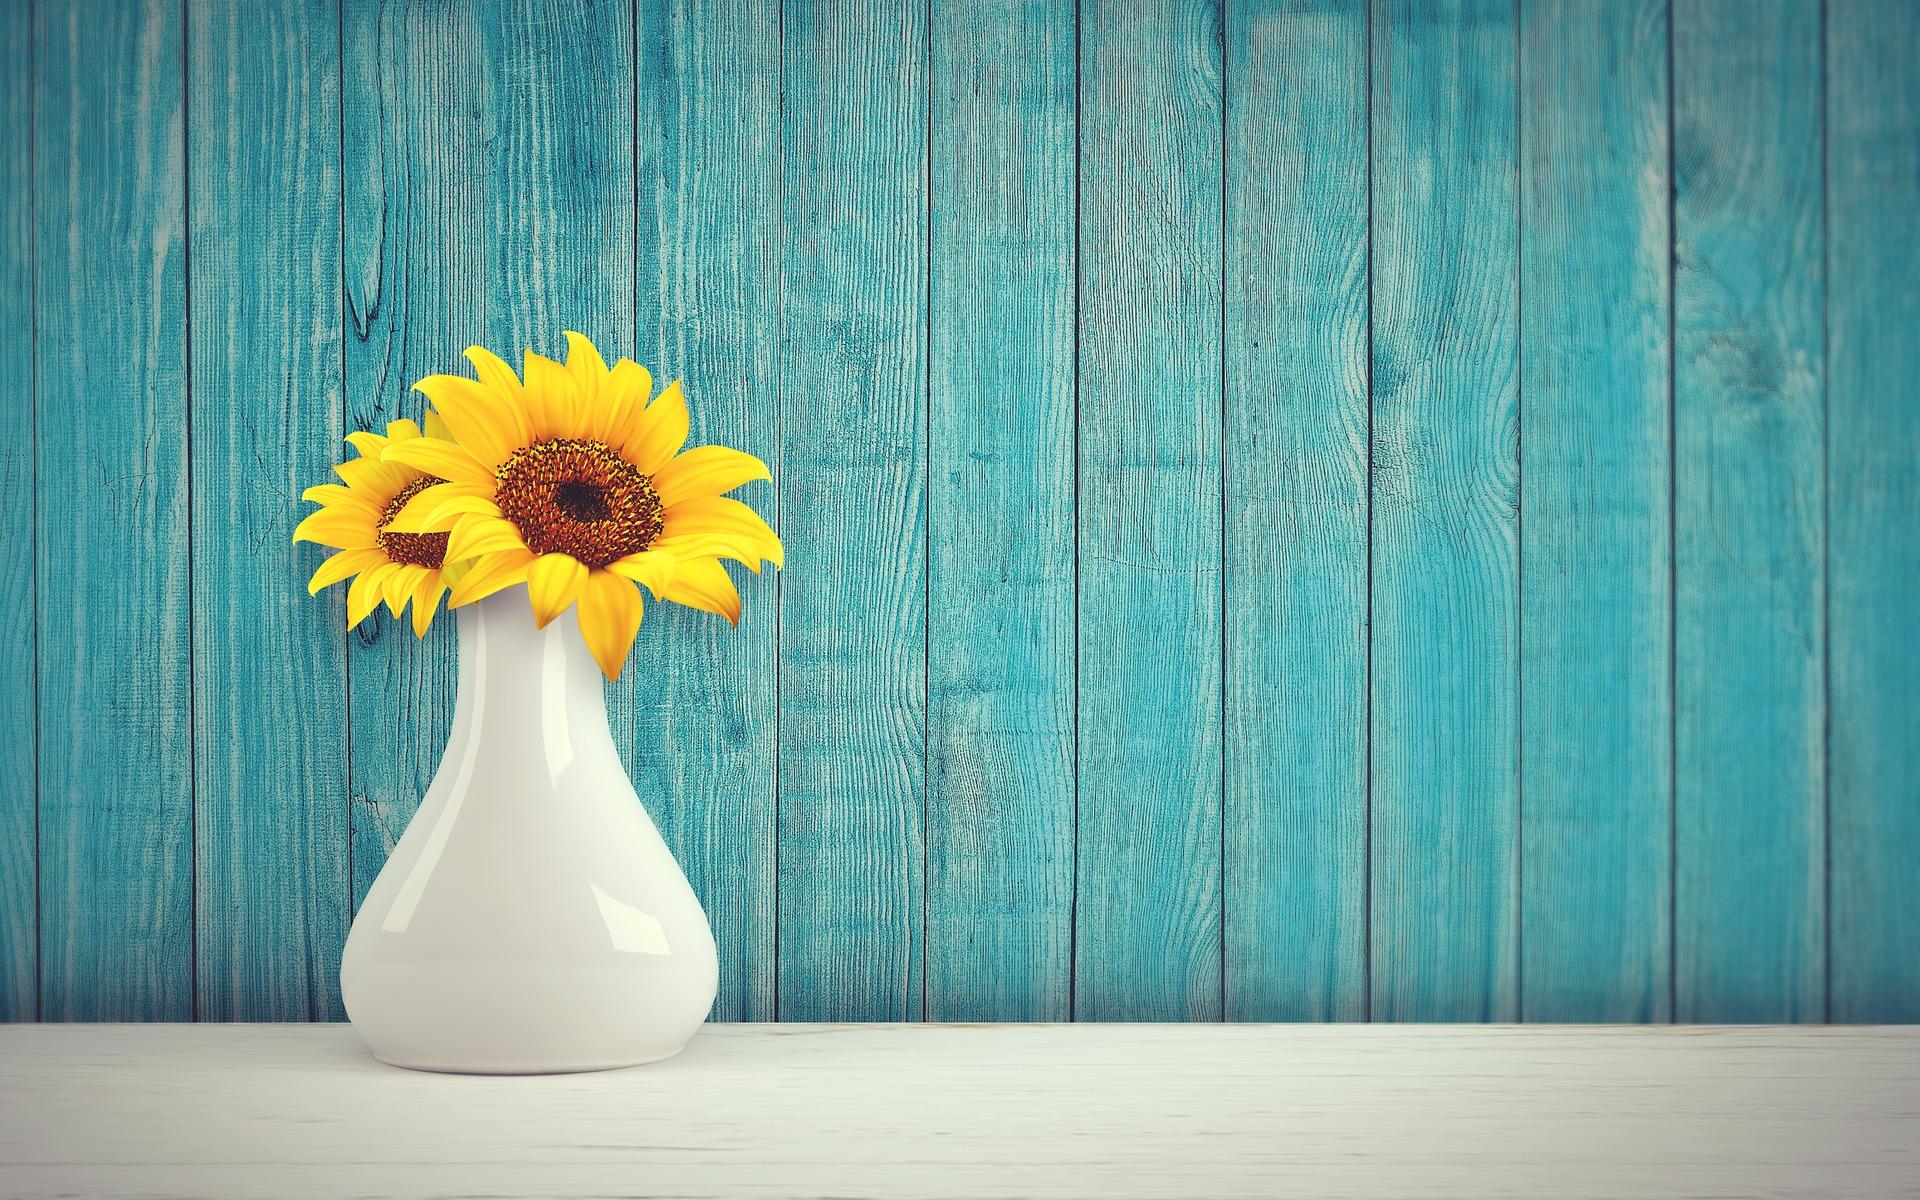 sunflower-3292932_1920